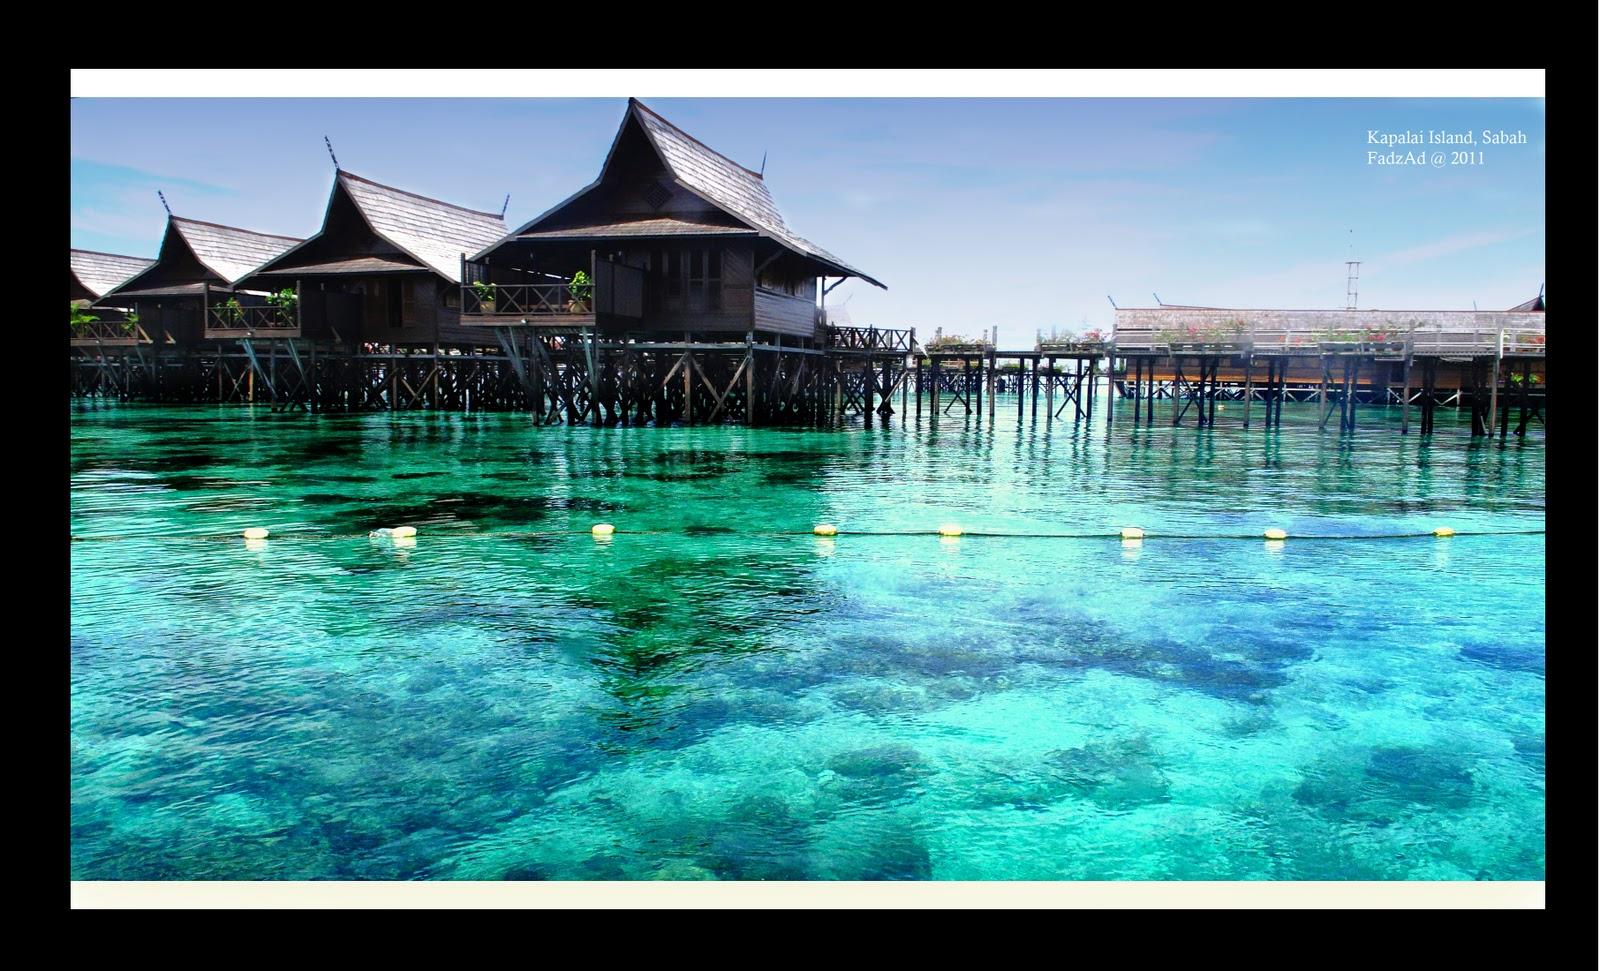 Scuba diving in malaysia sipadan kapalai dive resort - Sipadan dive resort ...